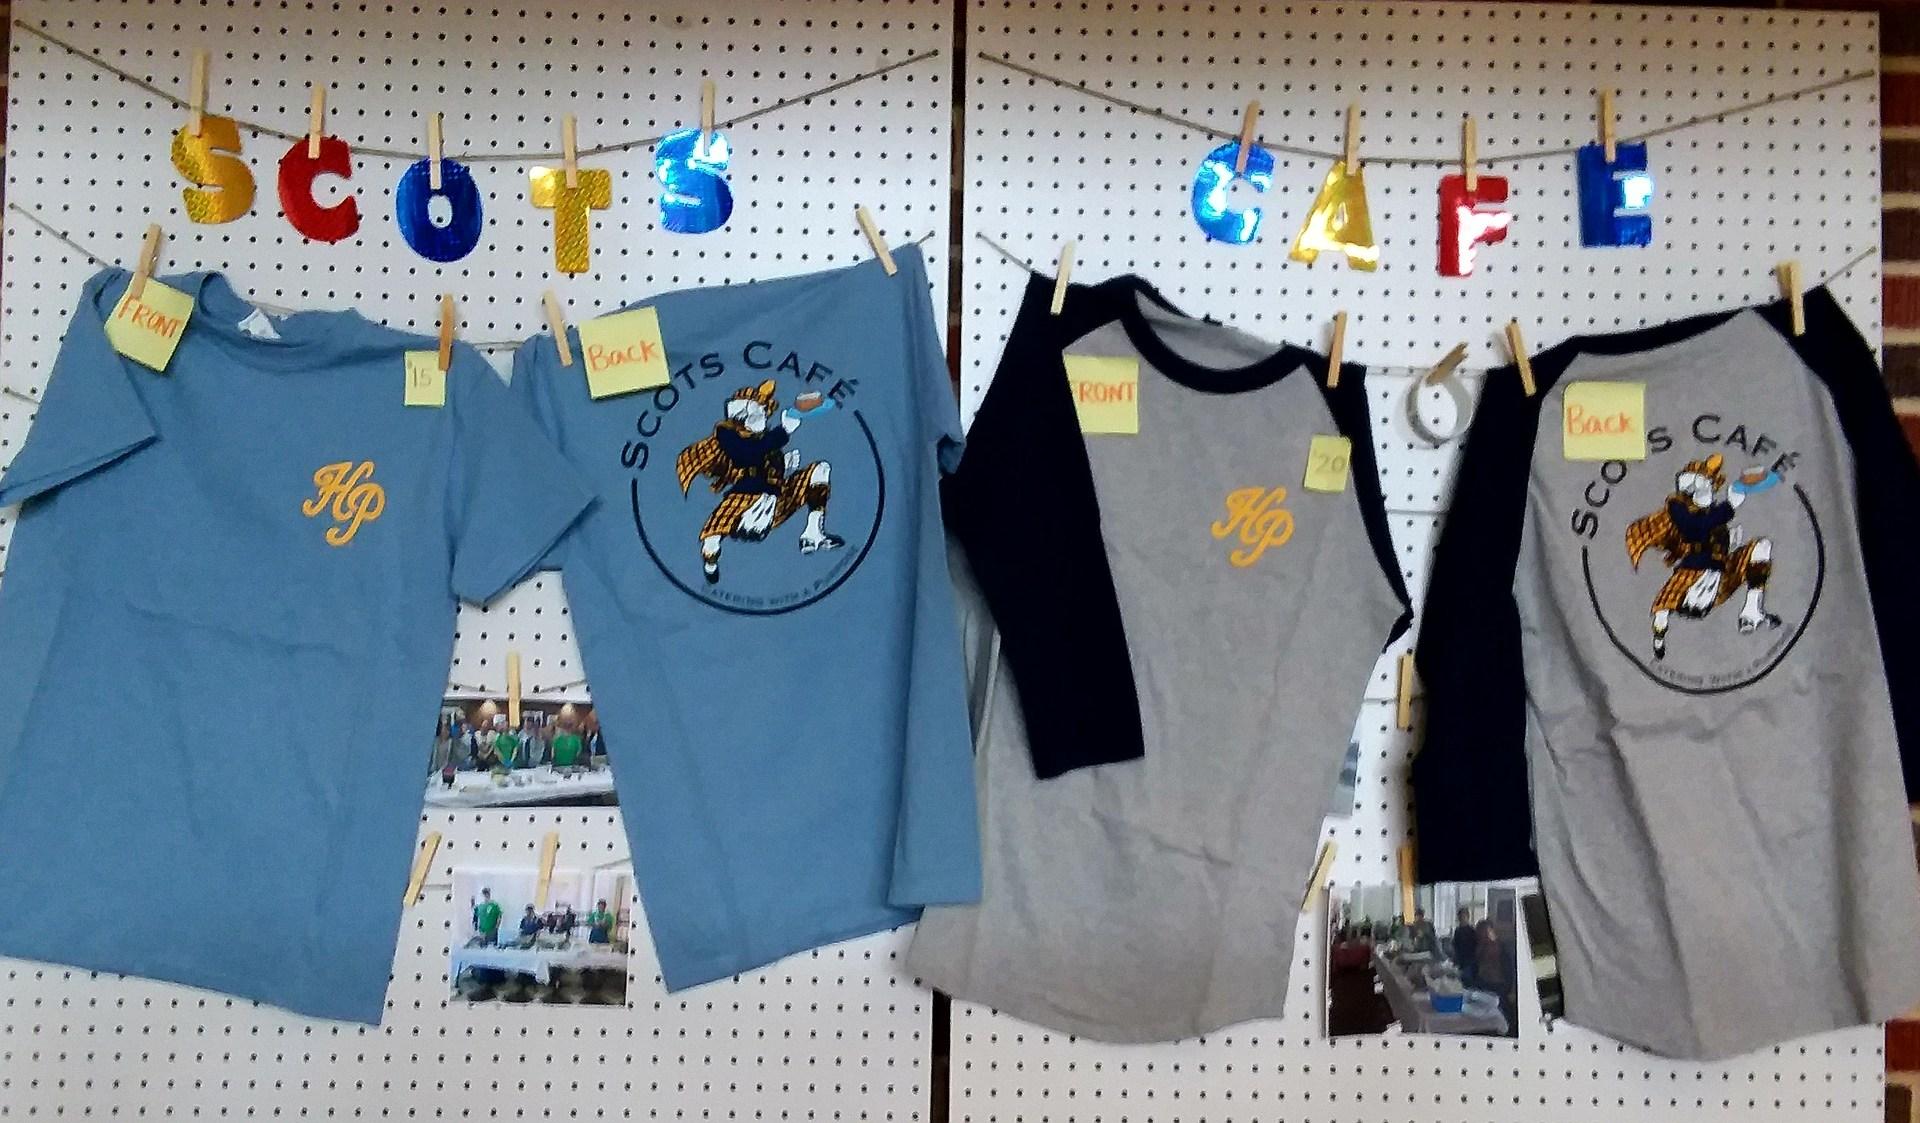 Scots Cafe t-shirts